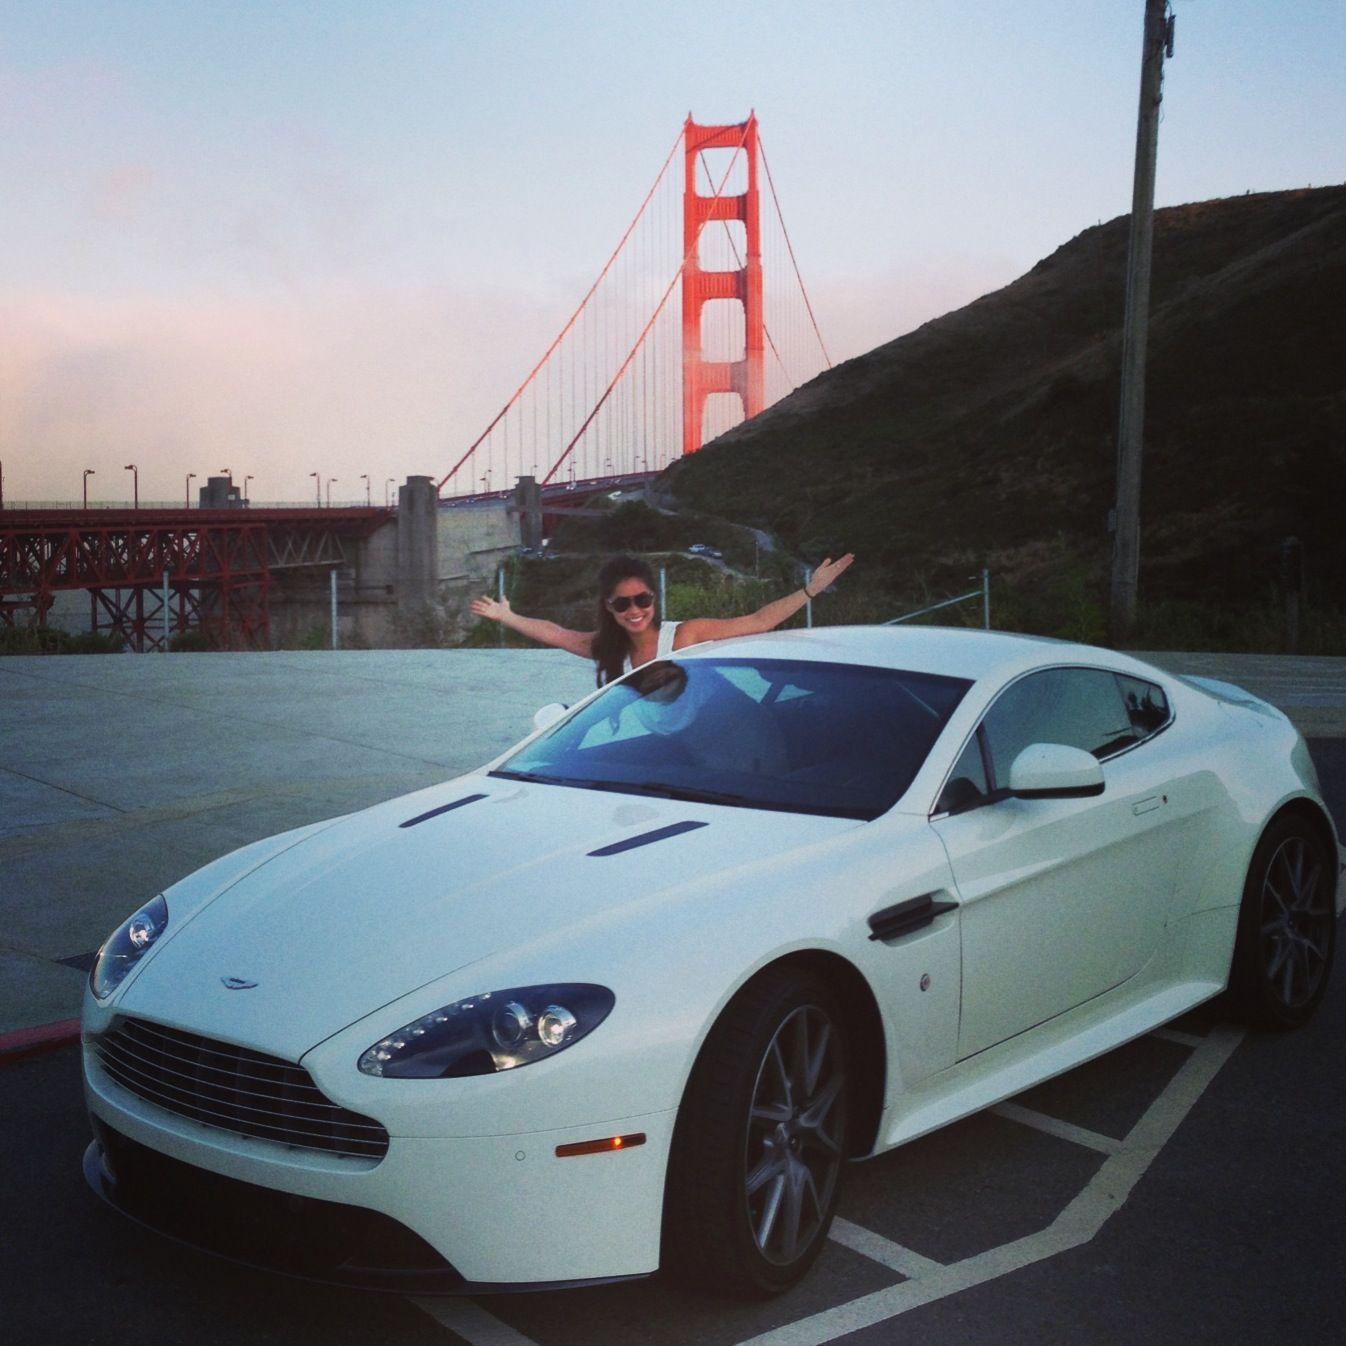 San francisco, Golden Gate Bridge, Aston Martin Vantage ... | aston martin san francisco